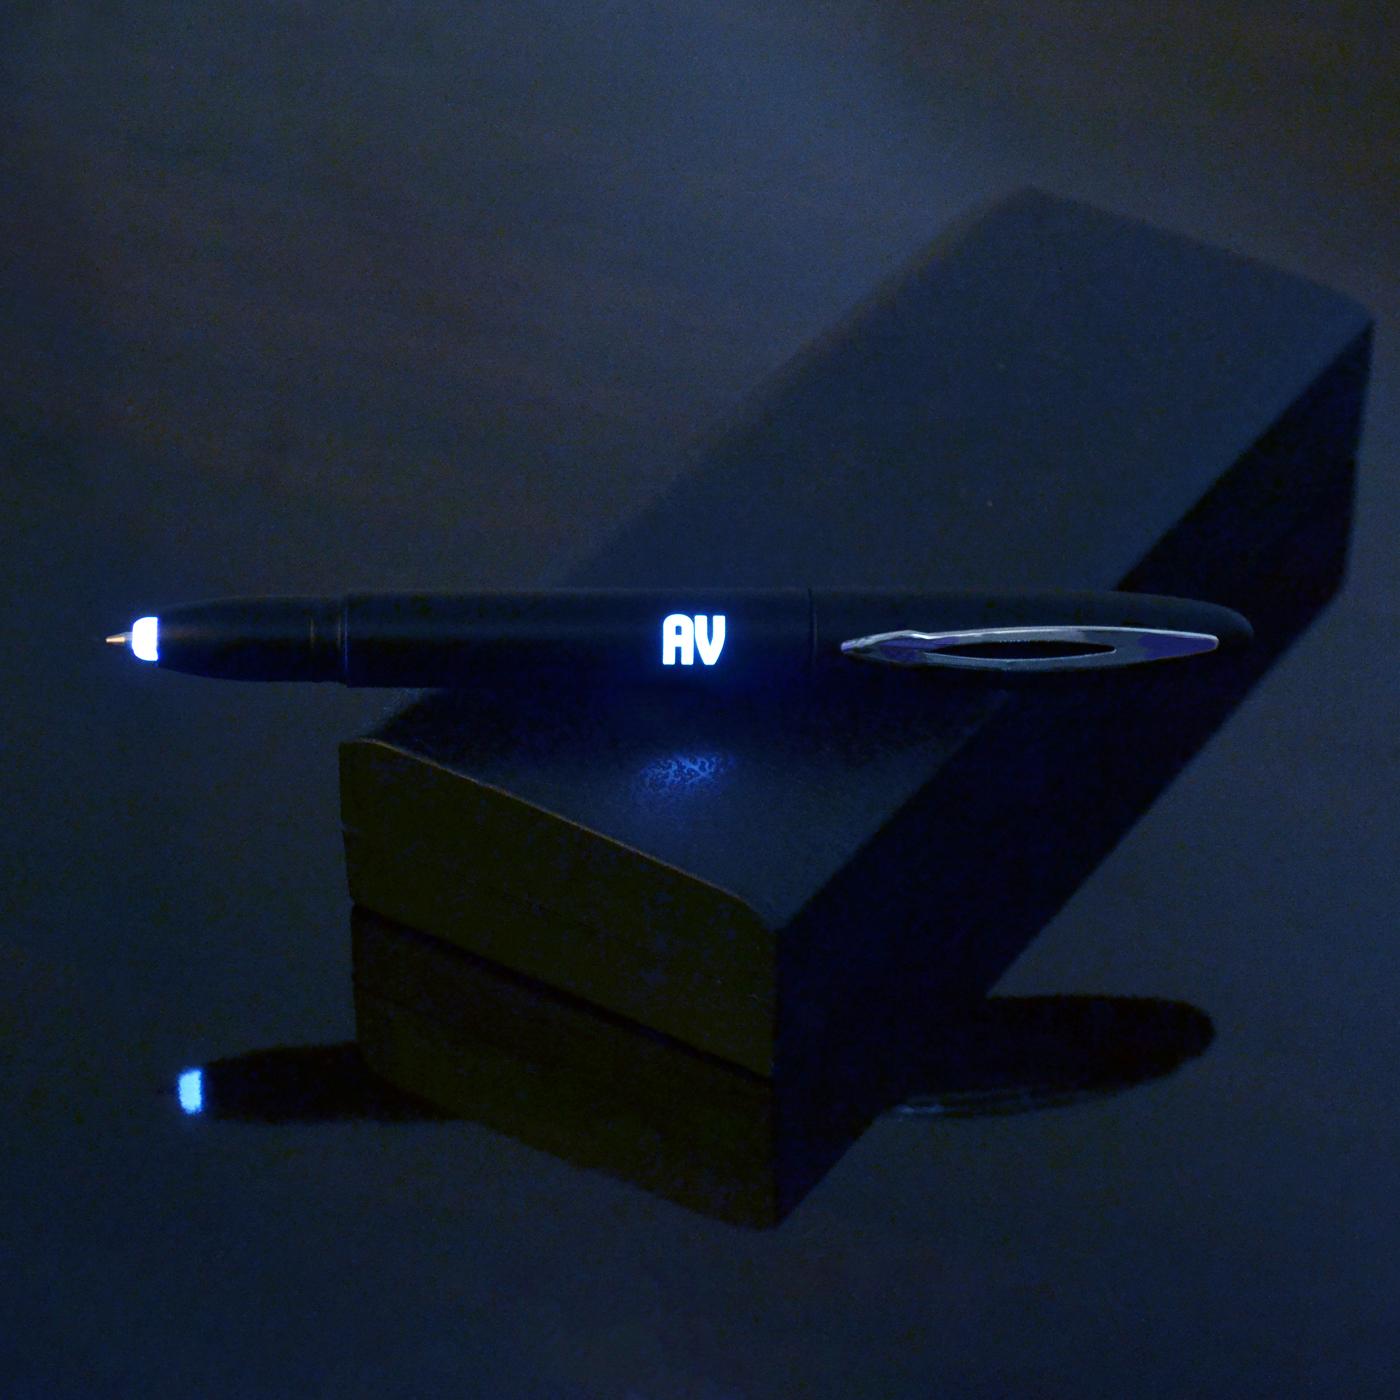 personalized led black pen